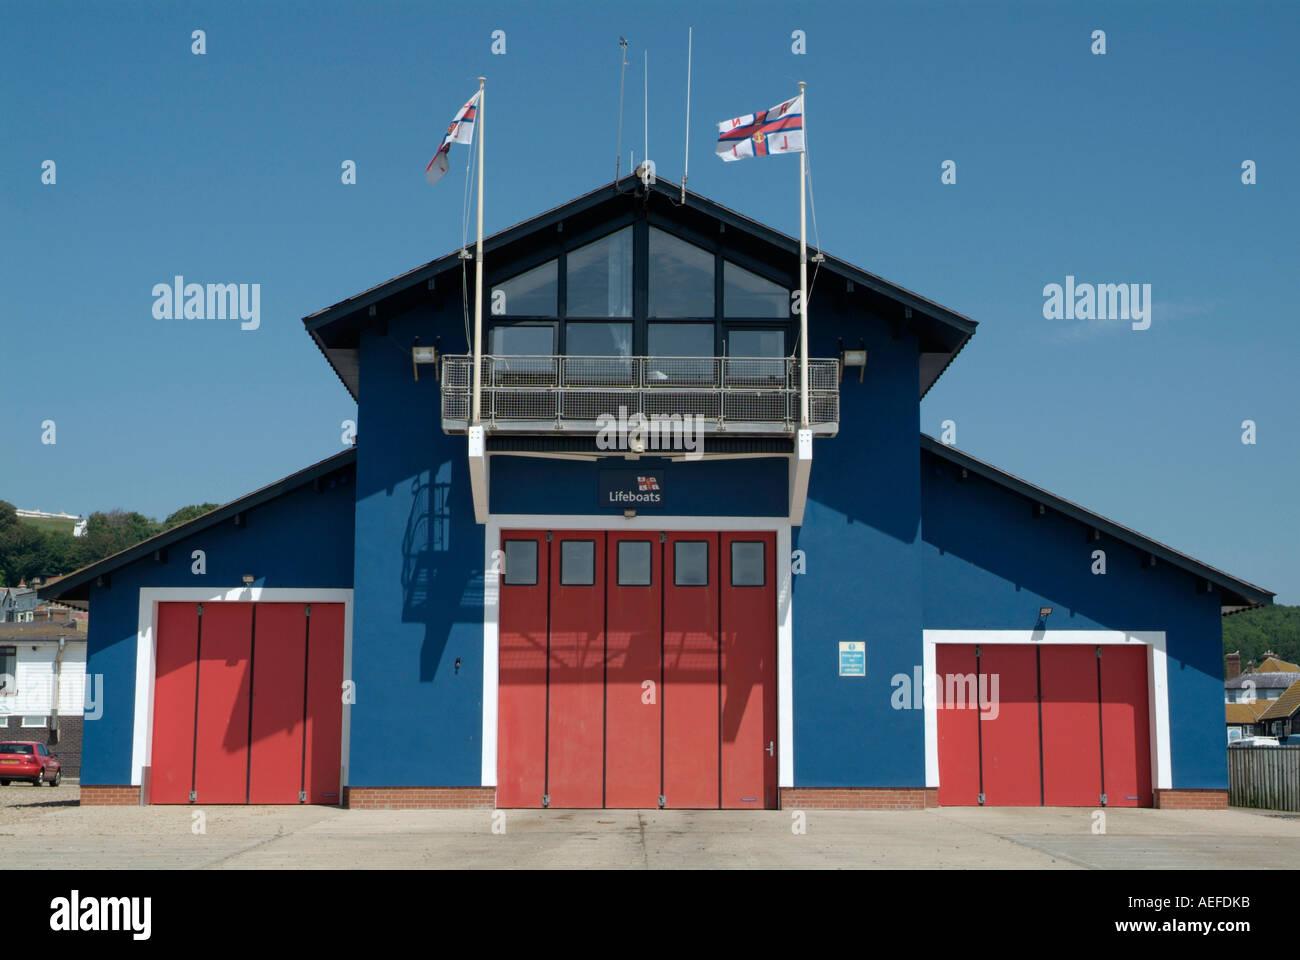 RNLI Lifeboat Station Hastings UK 24th June 2006 Stock Photo